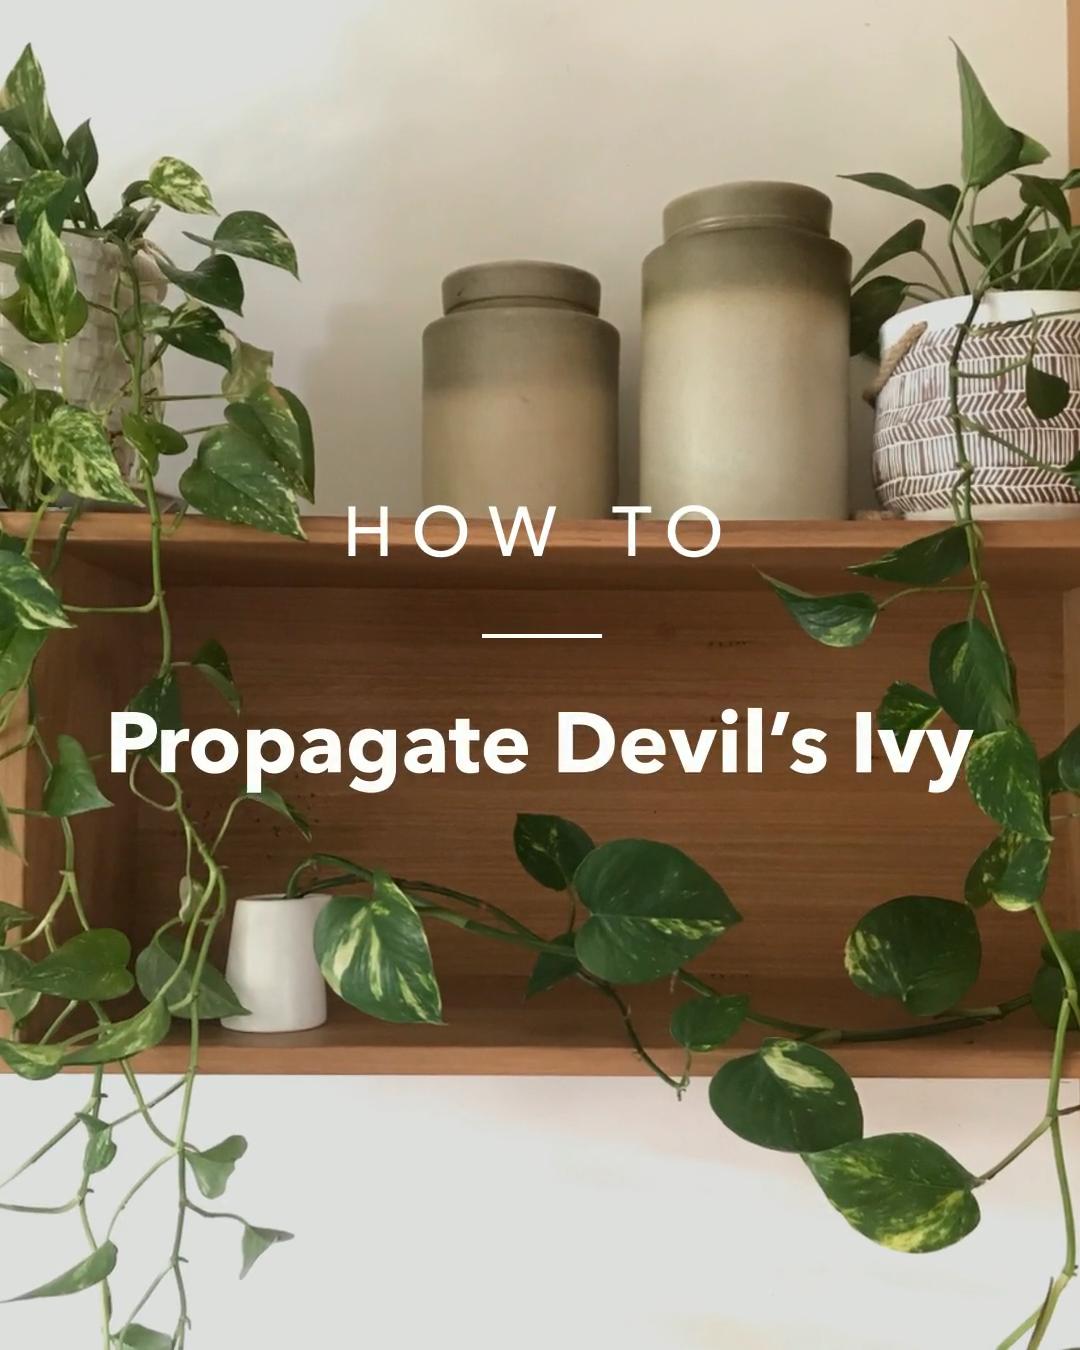 Propagate Devil's Ivy